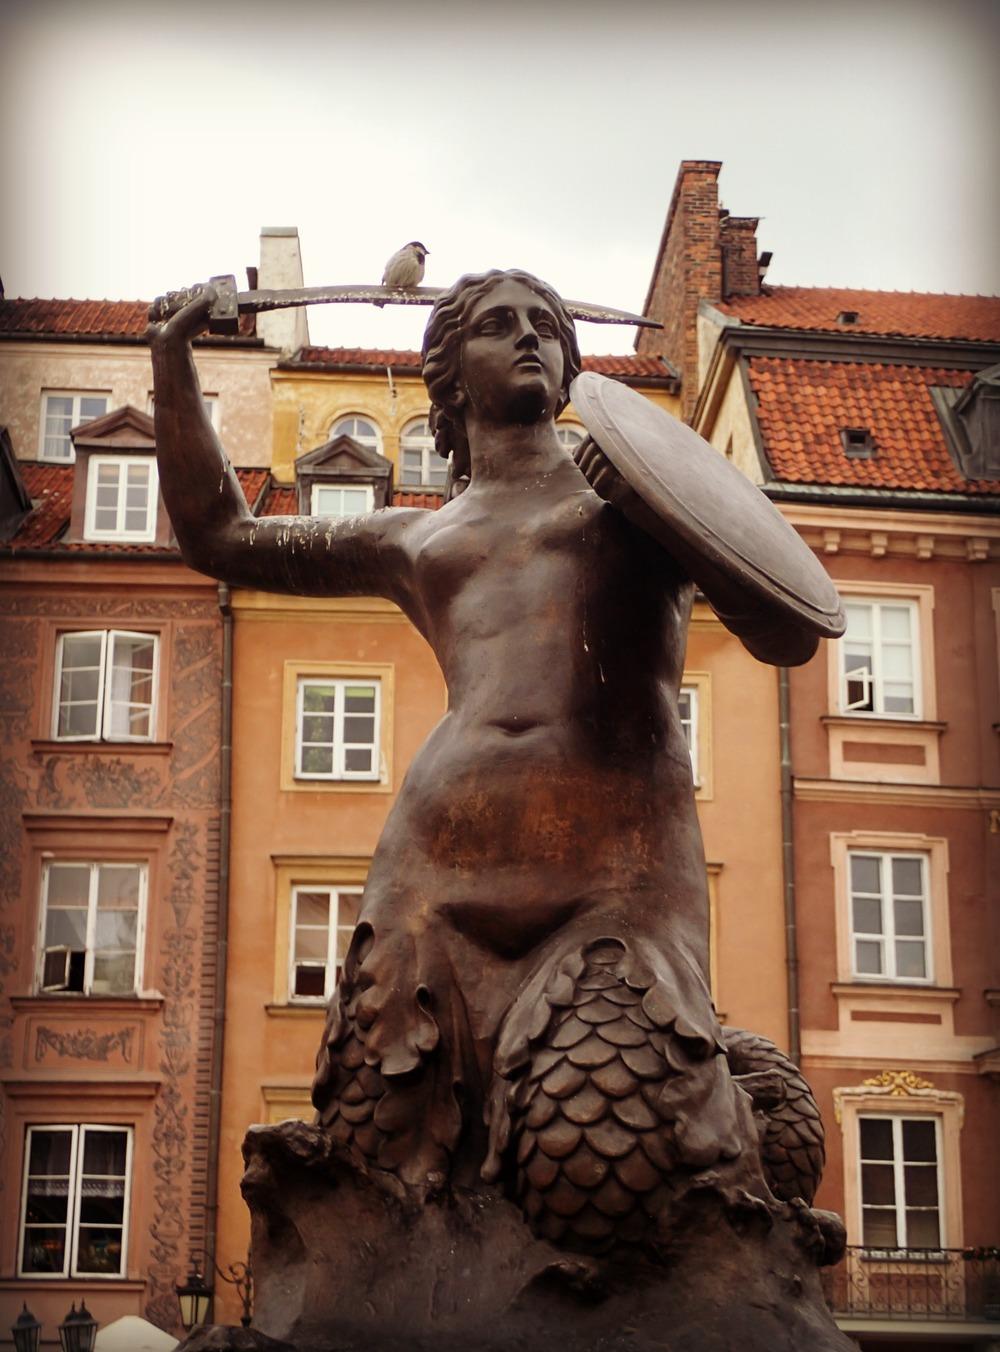 Statue of the Syrenka (Mermaid)